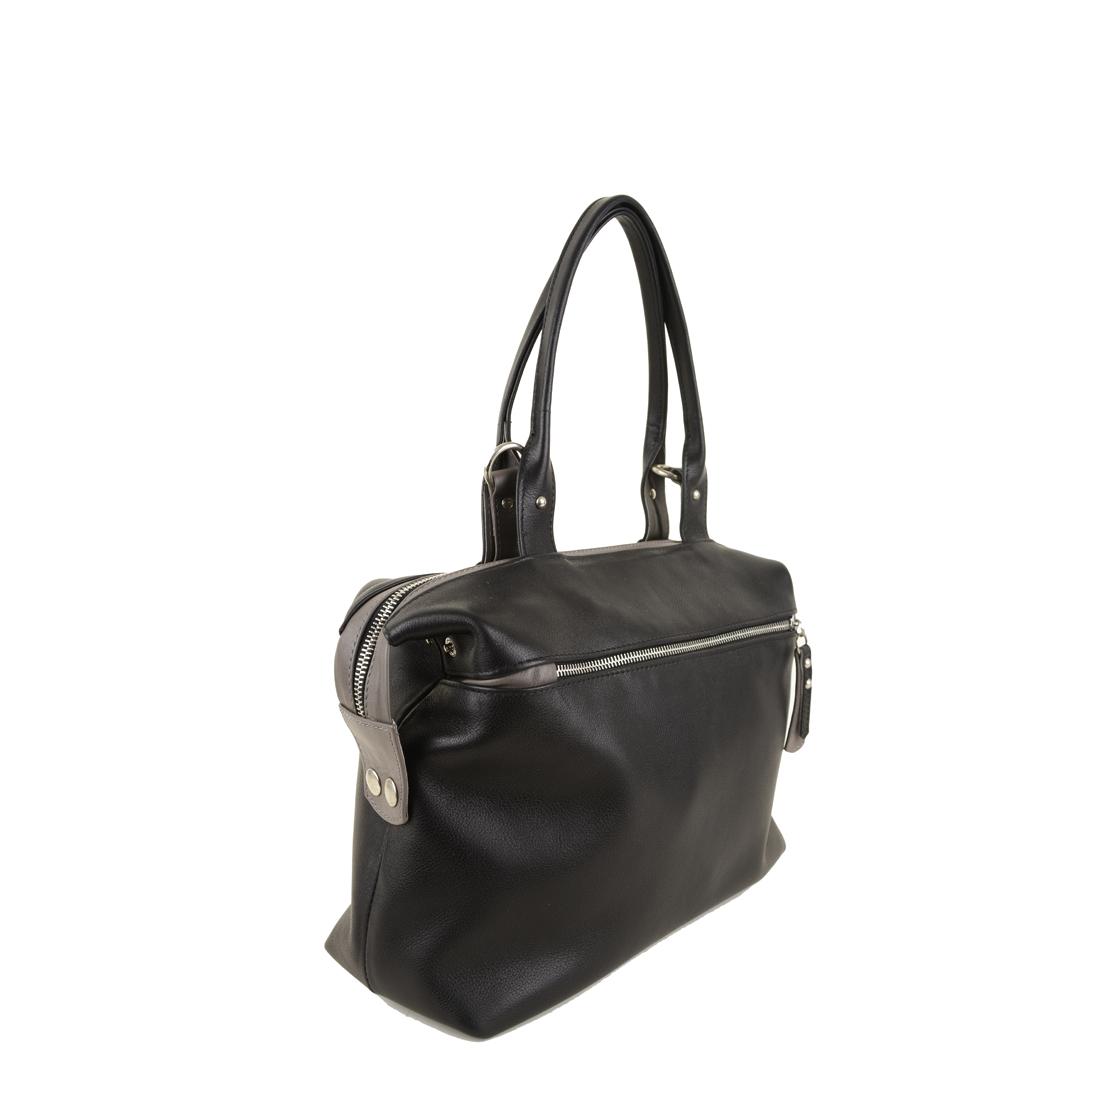 Grace Black Grigio Leather Tote Bag